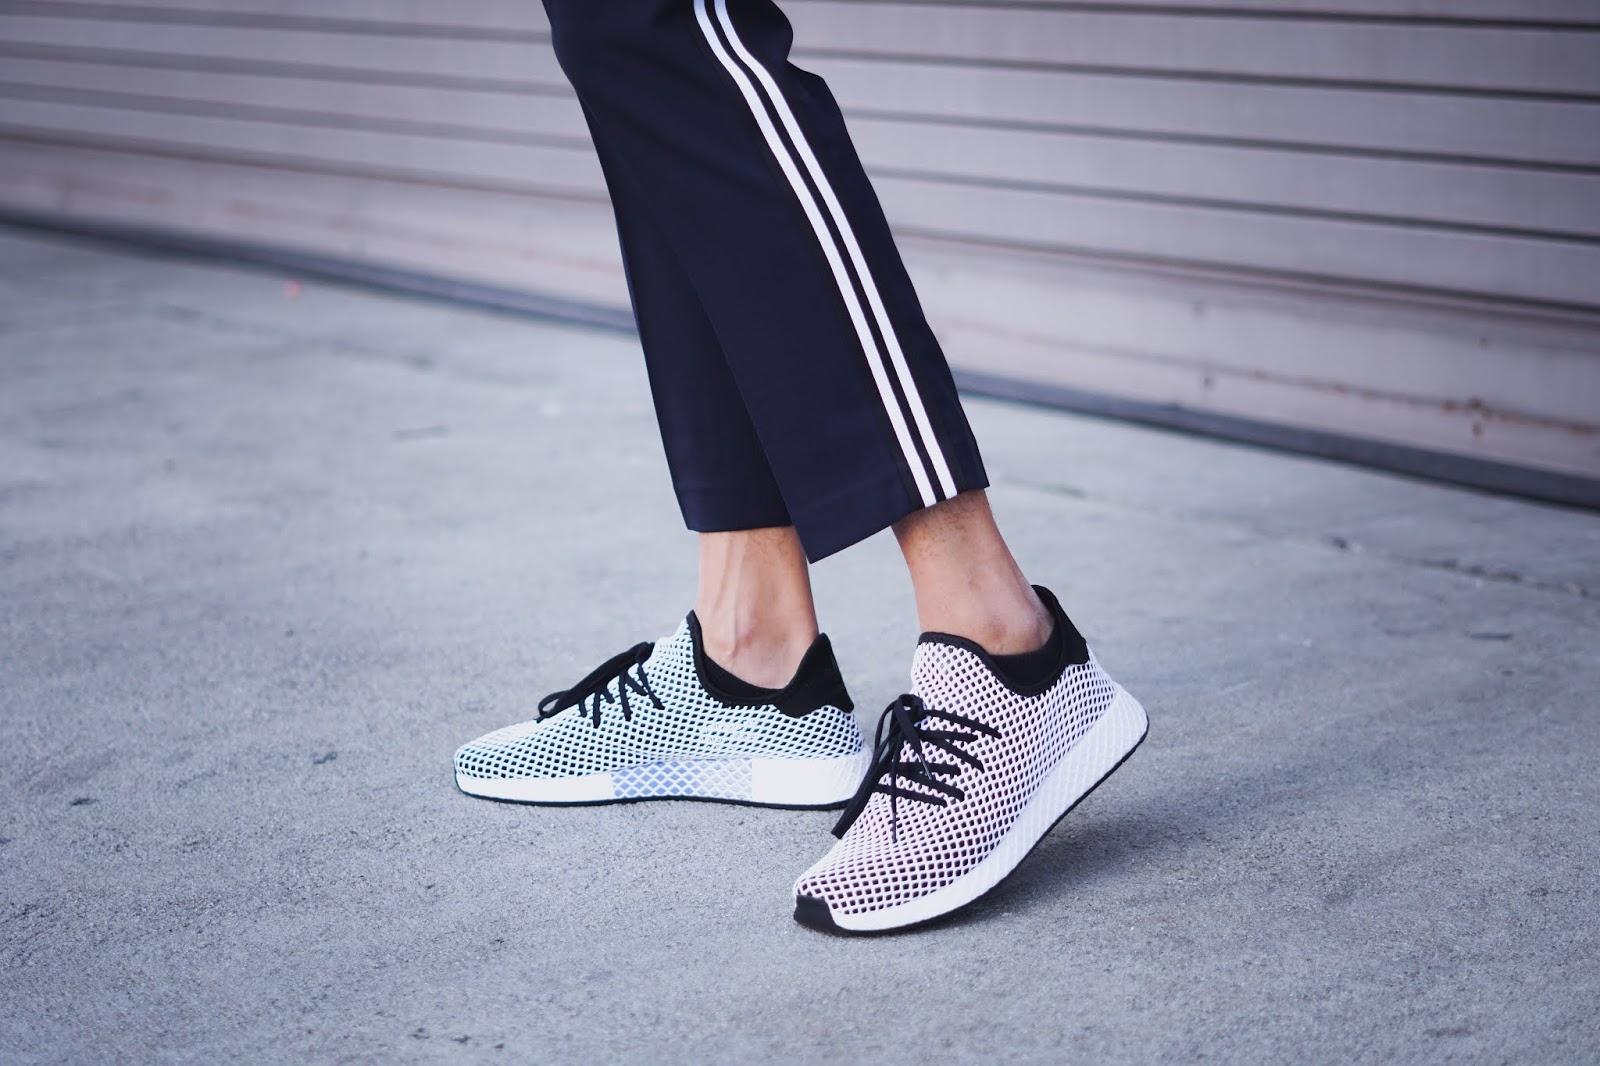 mens fashion mens wear on the go sneaker for men best on the go shoe Adidas deerupt